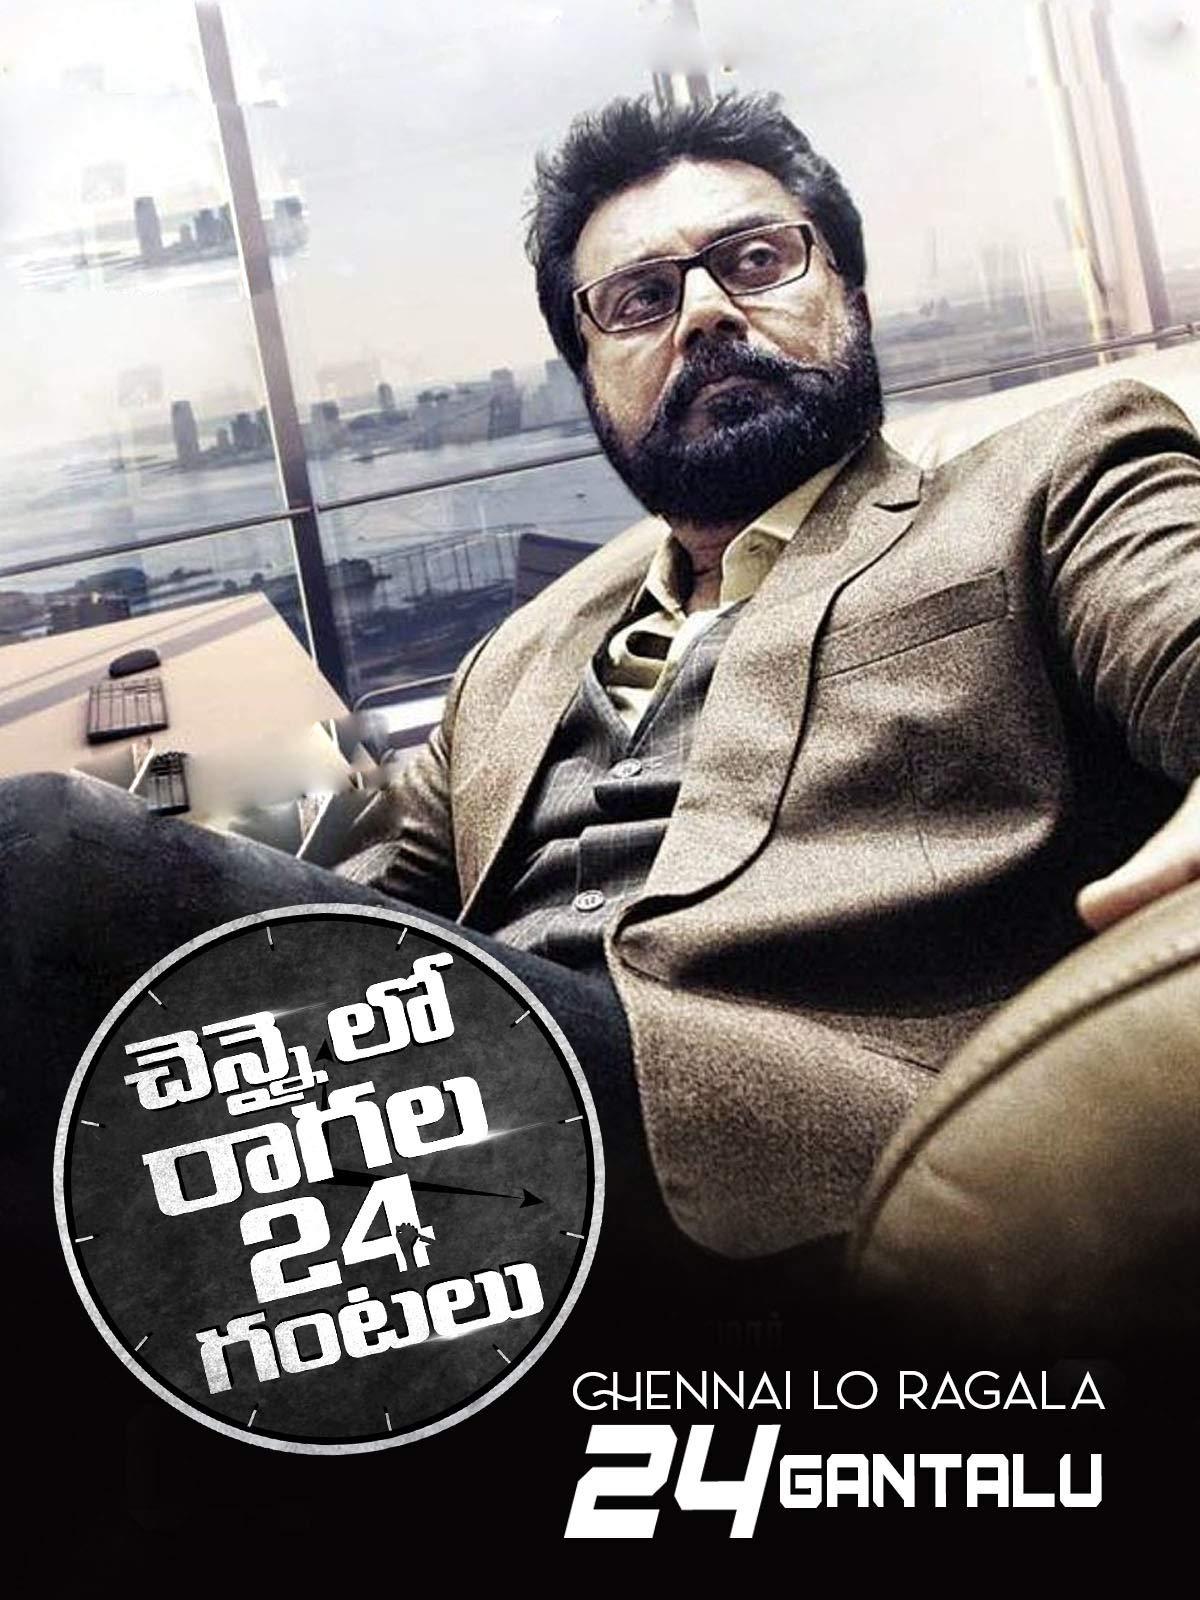 Chennai lo Ragala 24 Gantalu